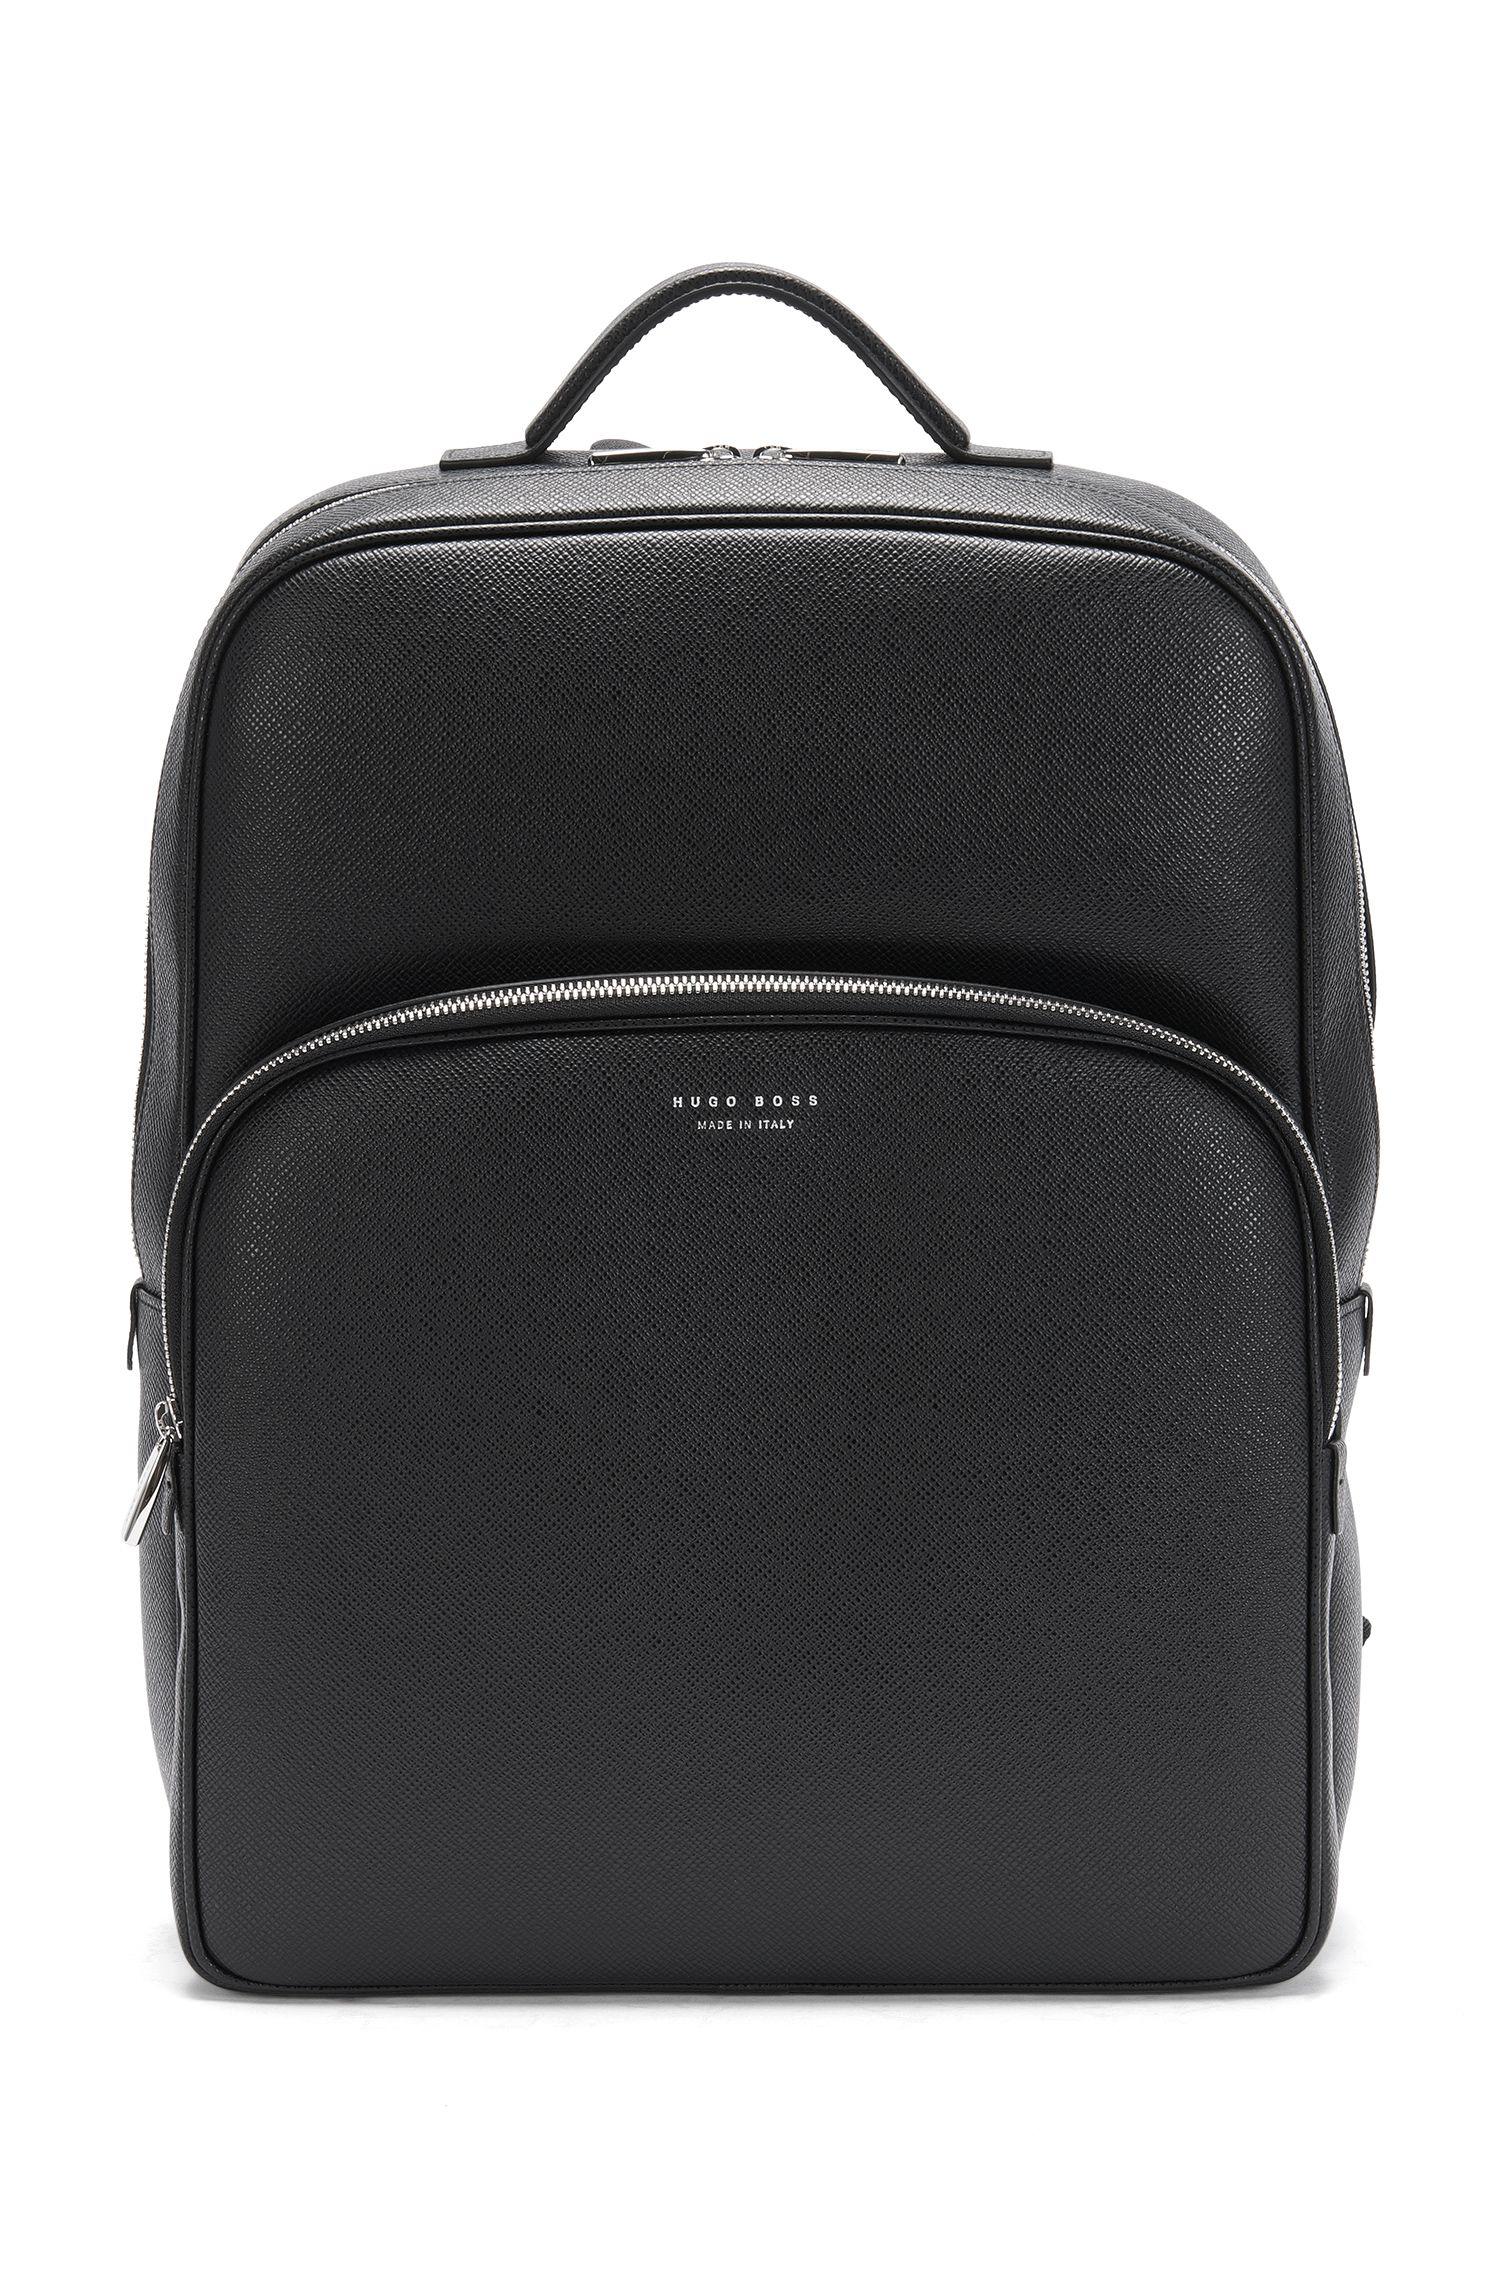 'Signature B Backpack' | Calfskin Palmellato Backpack